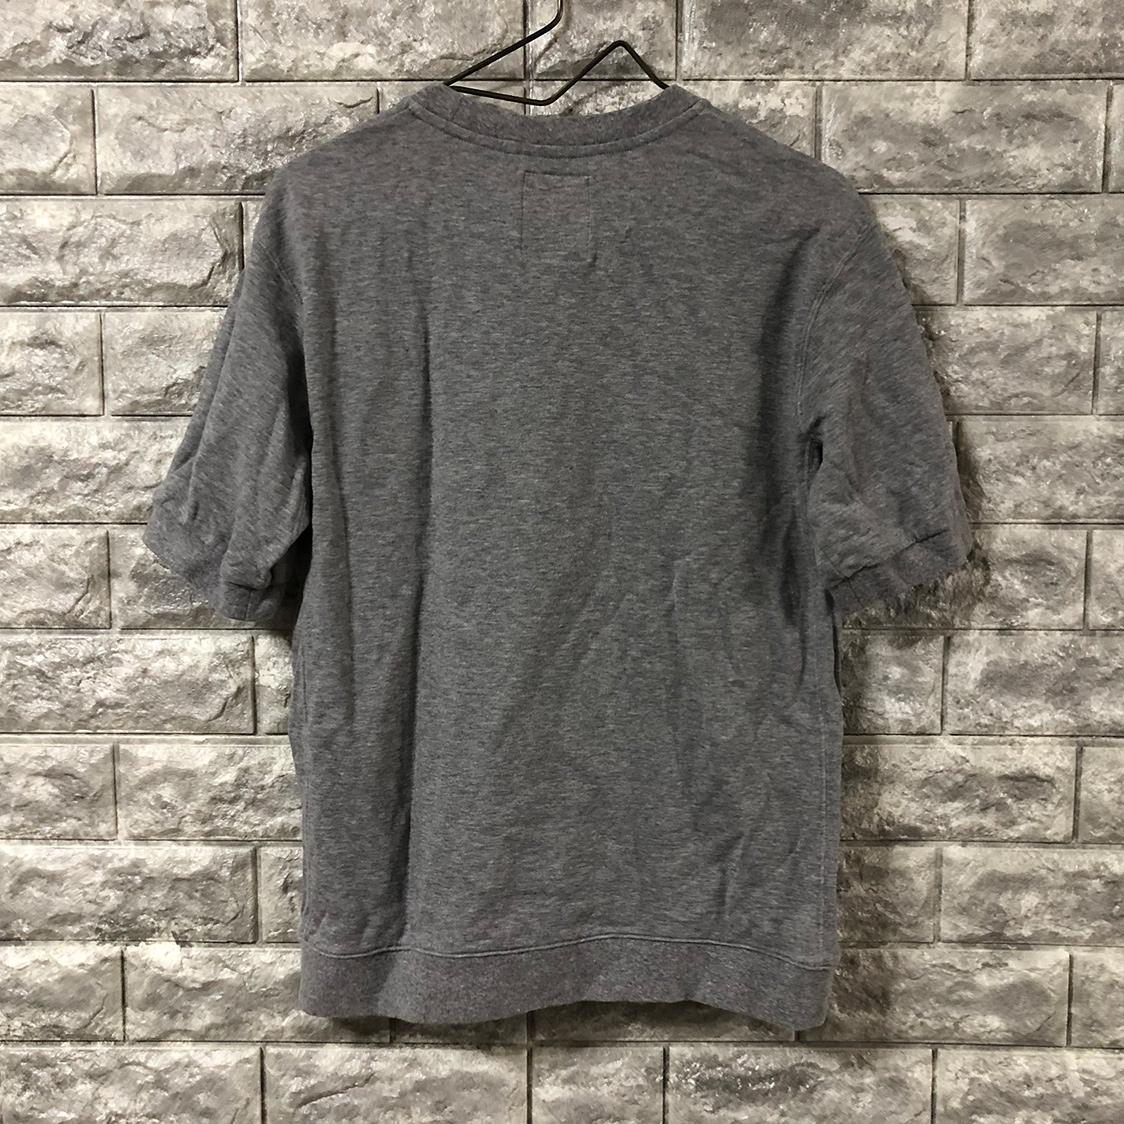 STILL BY HAND スティル バイ ハンド スウェット Tシャツ カットソー グレー サイズ46